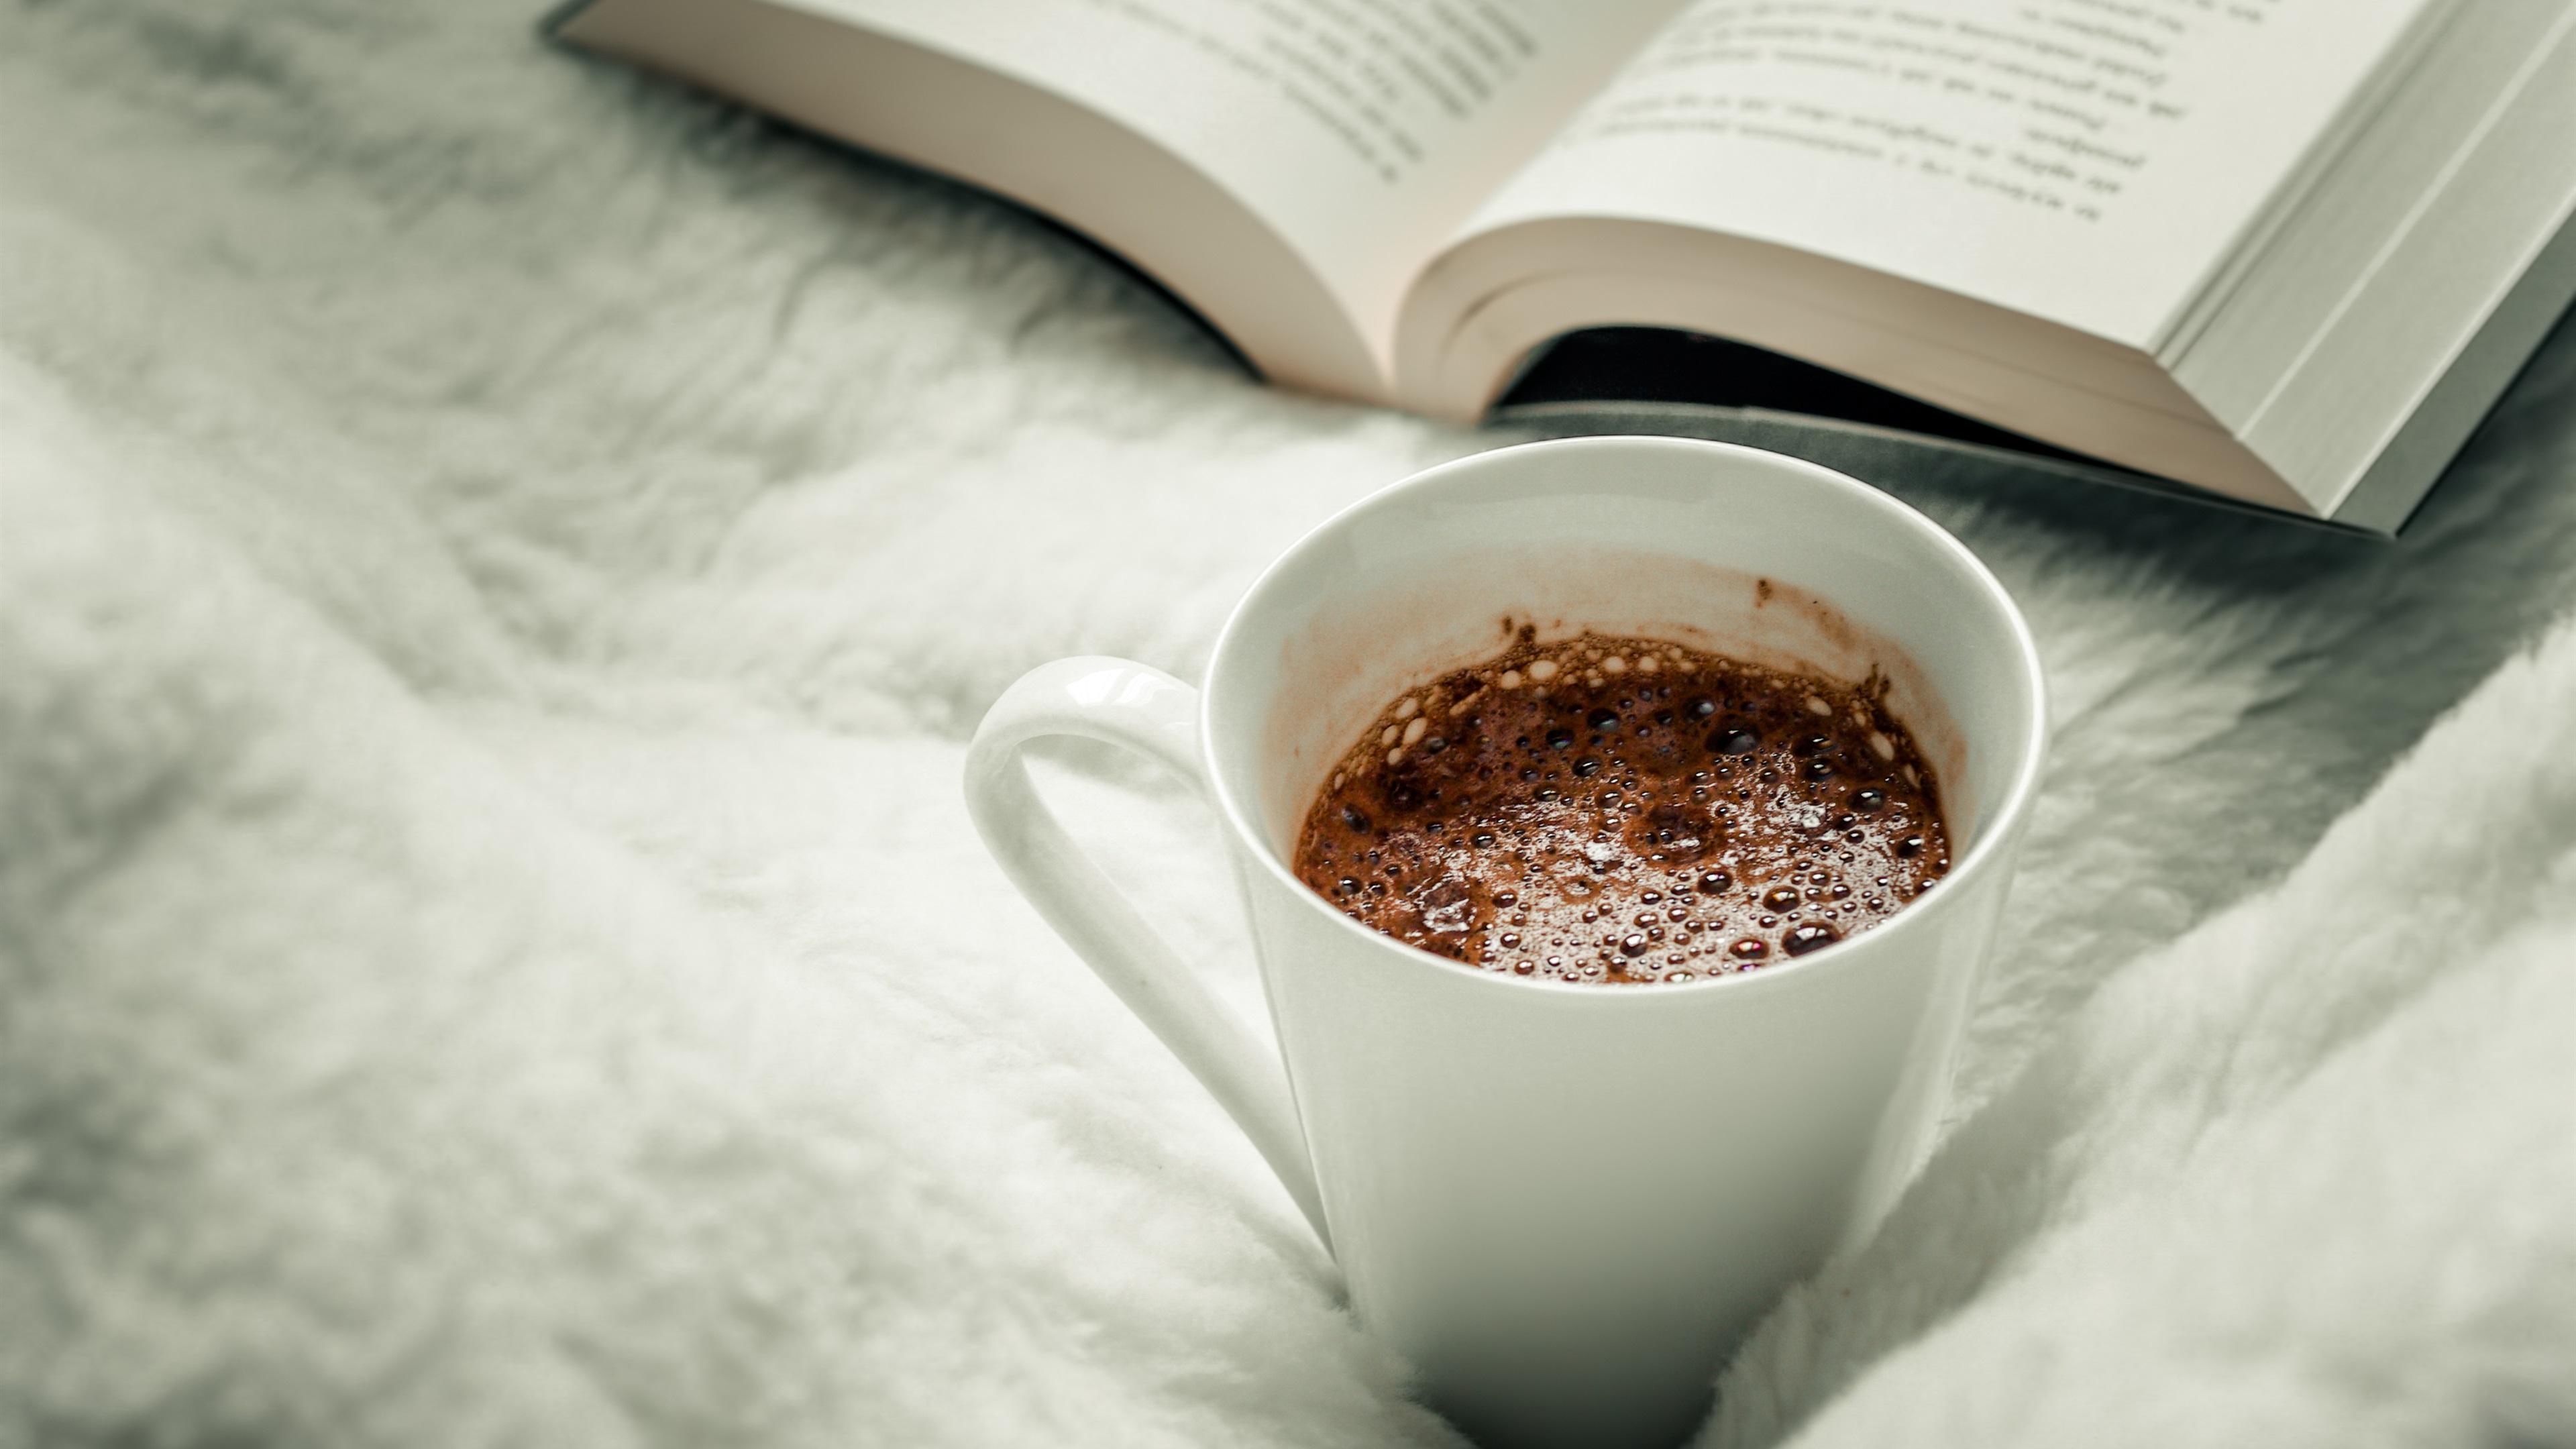 Wallpaper Coffee Mug Book Fond D Ecran Cafe 3840x2160 Wallpaper Teahub Io